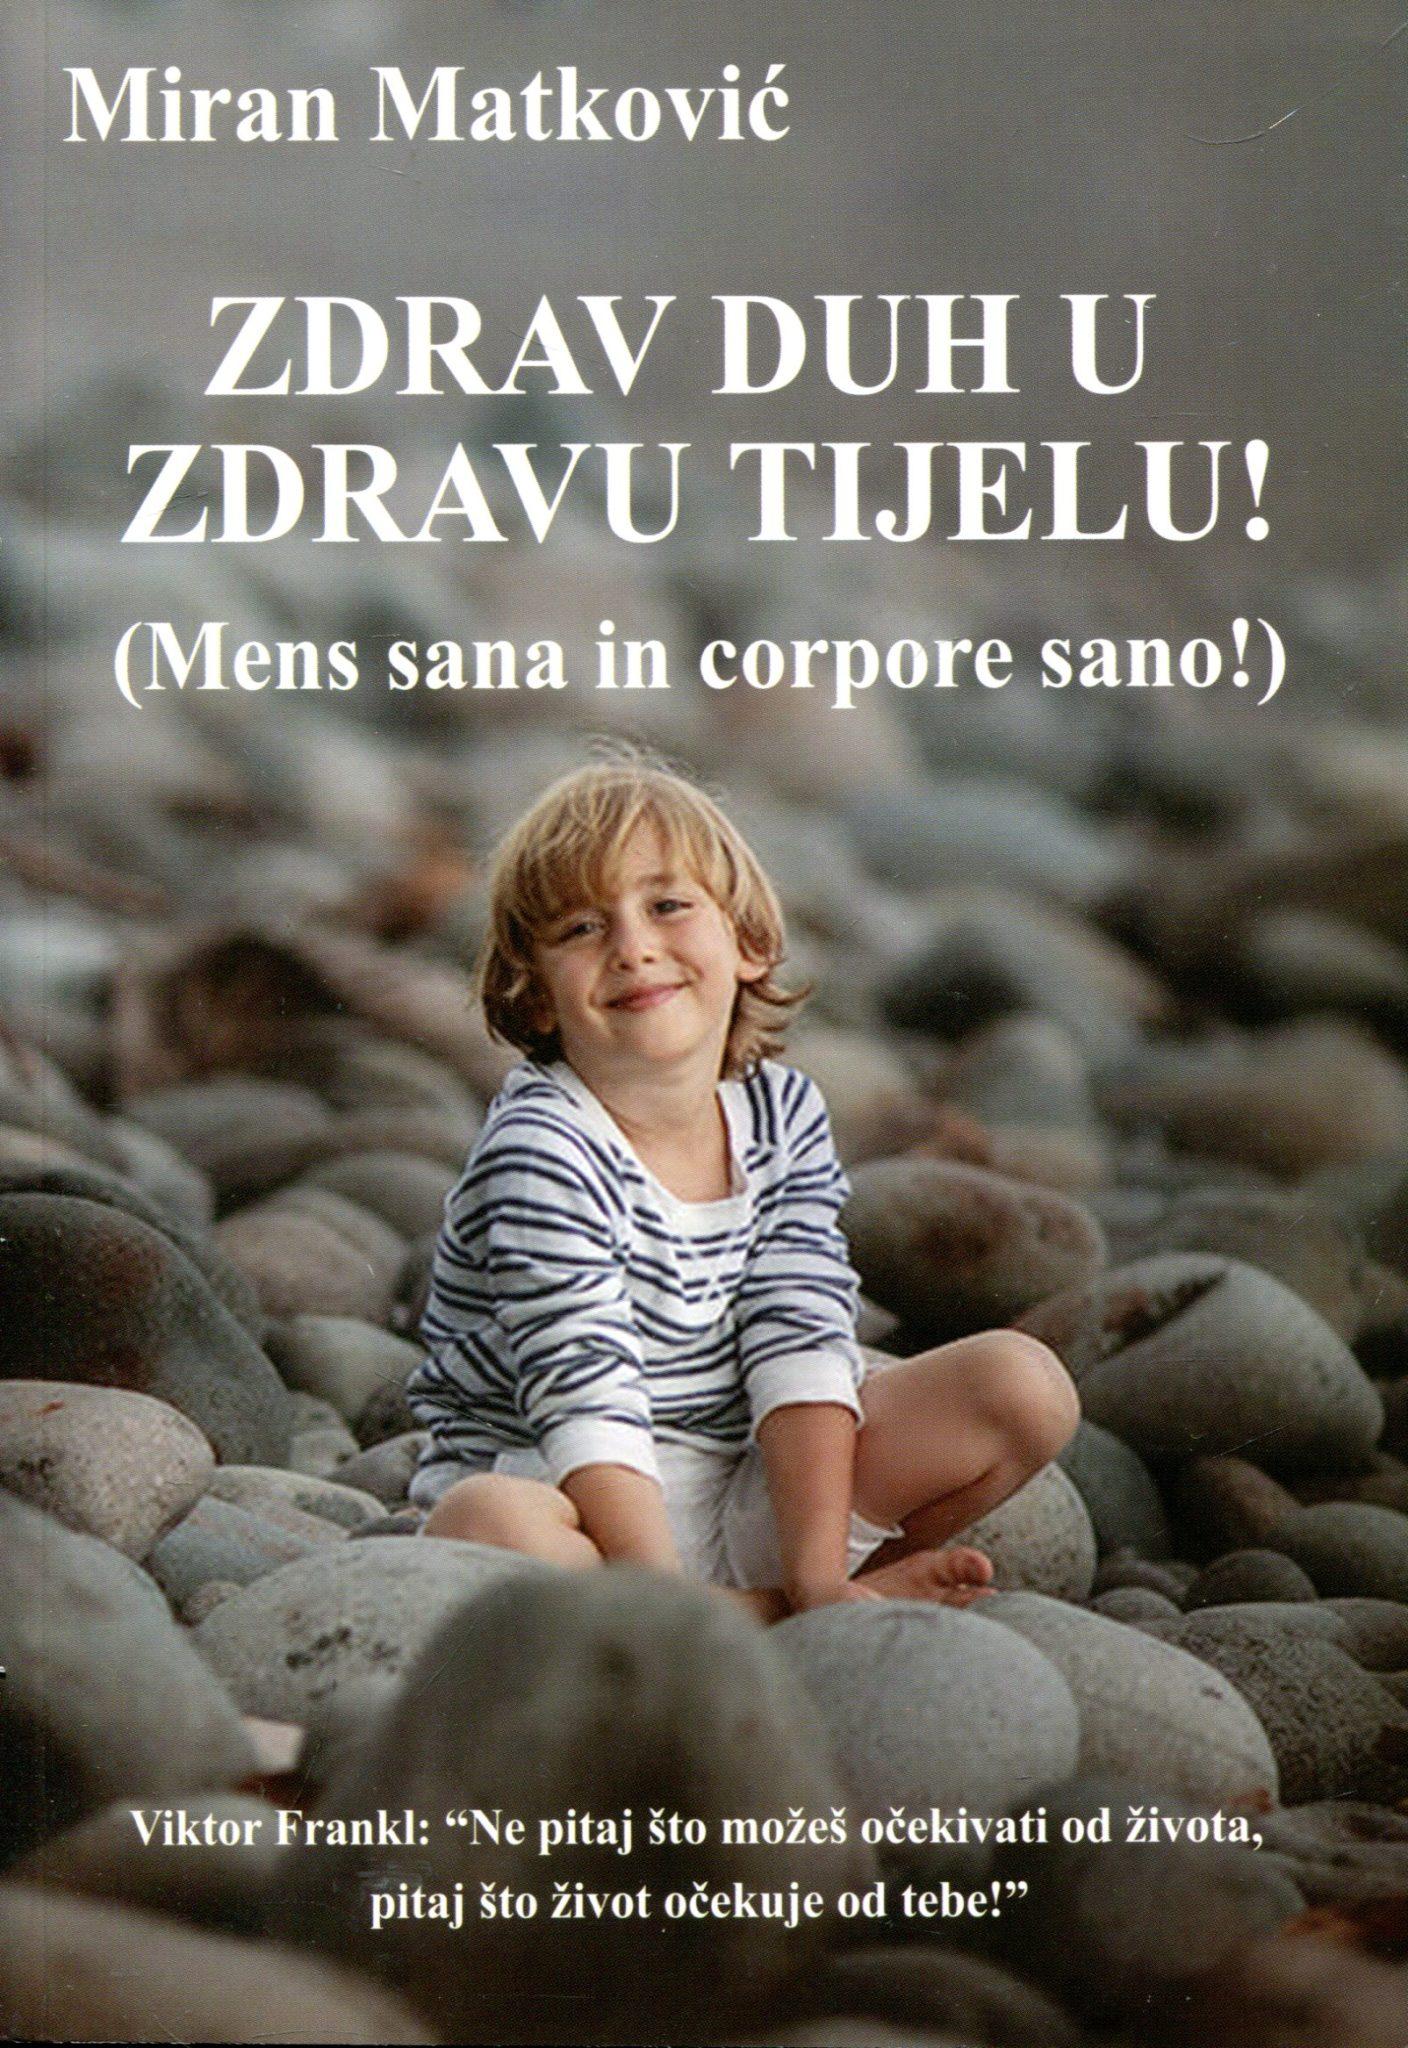 Zdrav duh u zdravu tijelu! Miran Matković